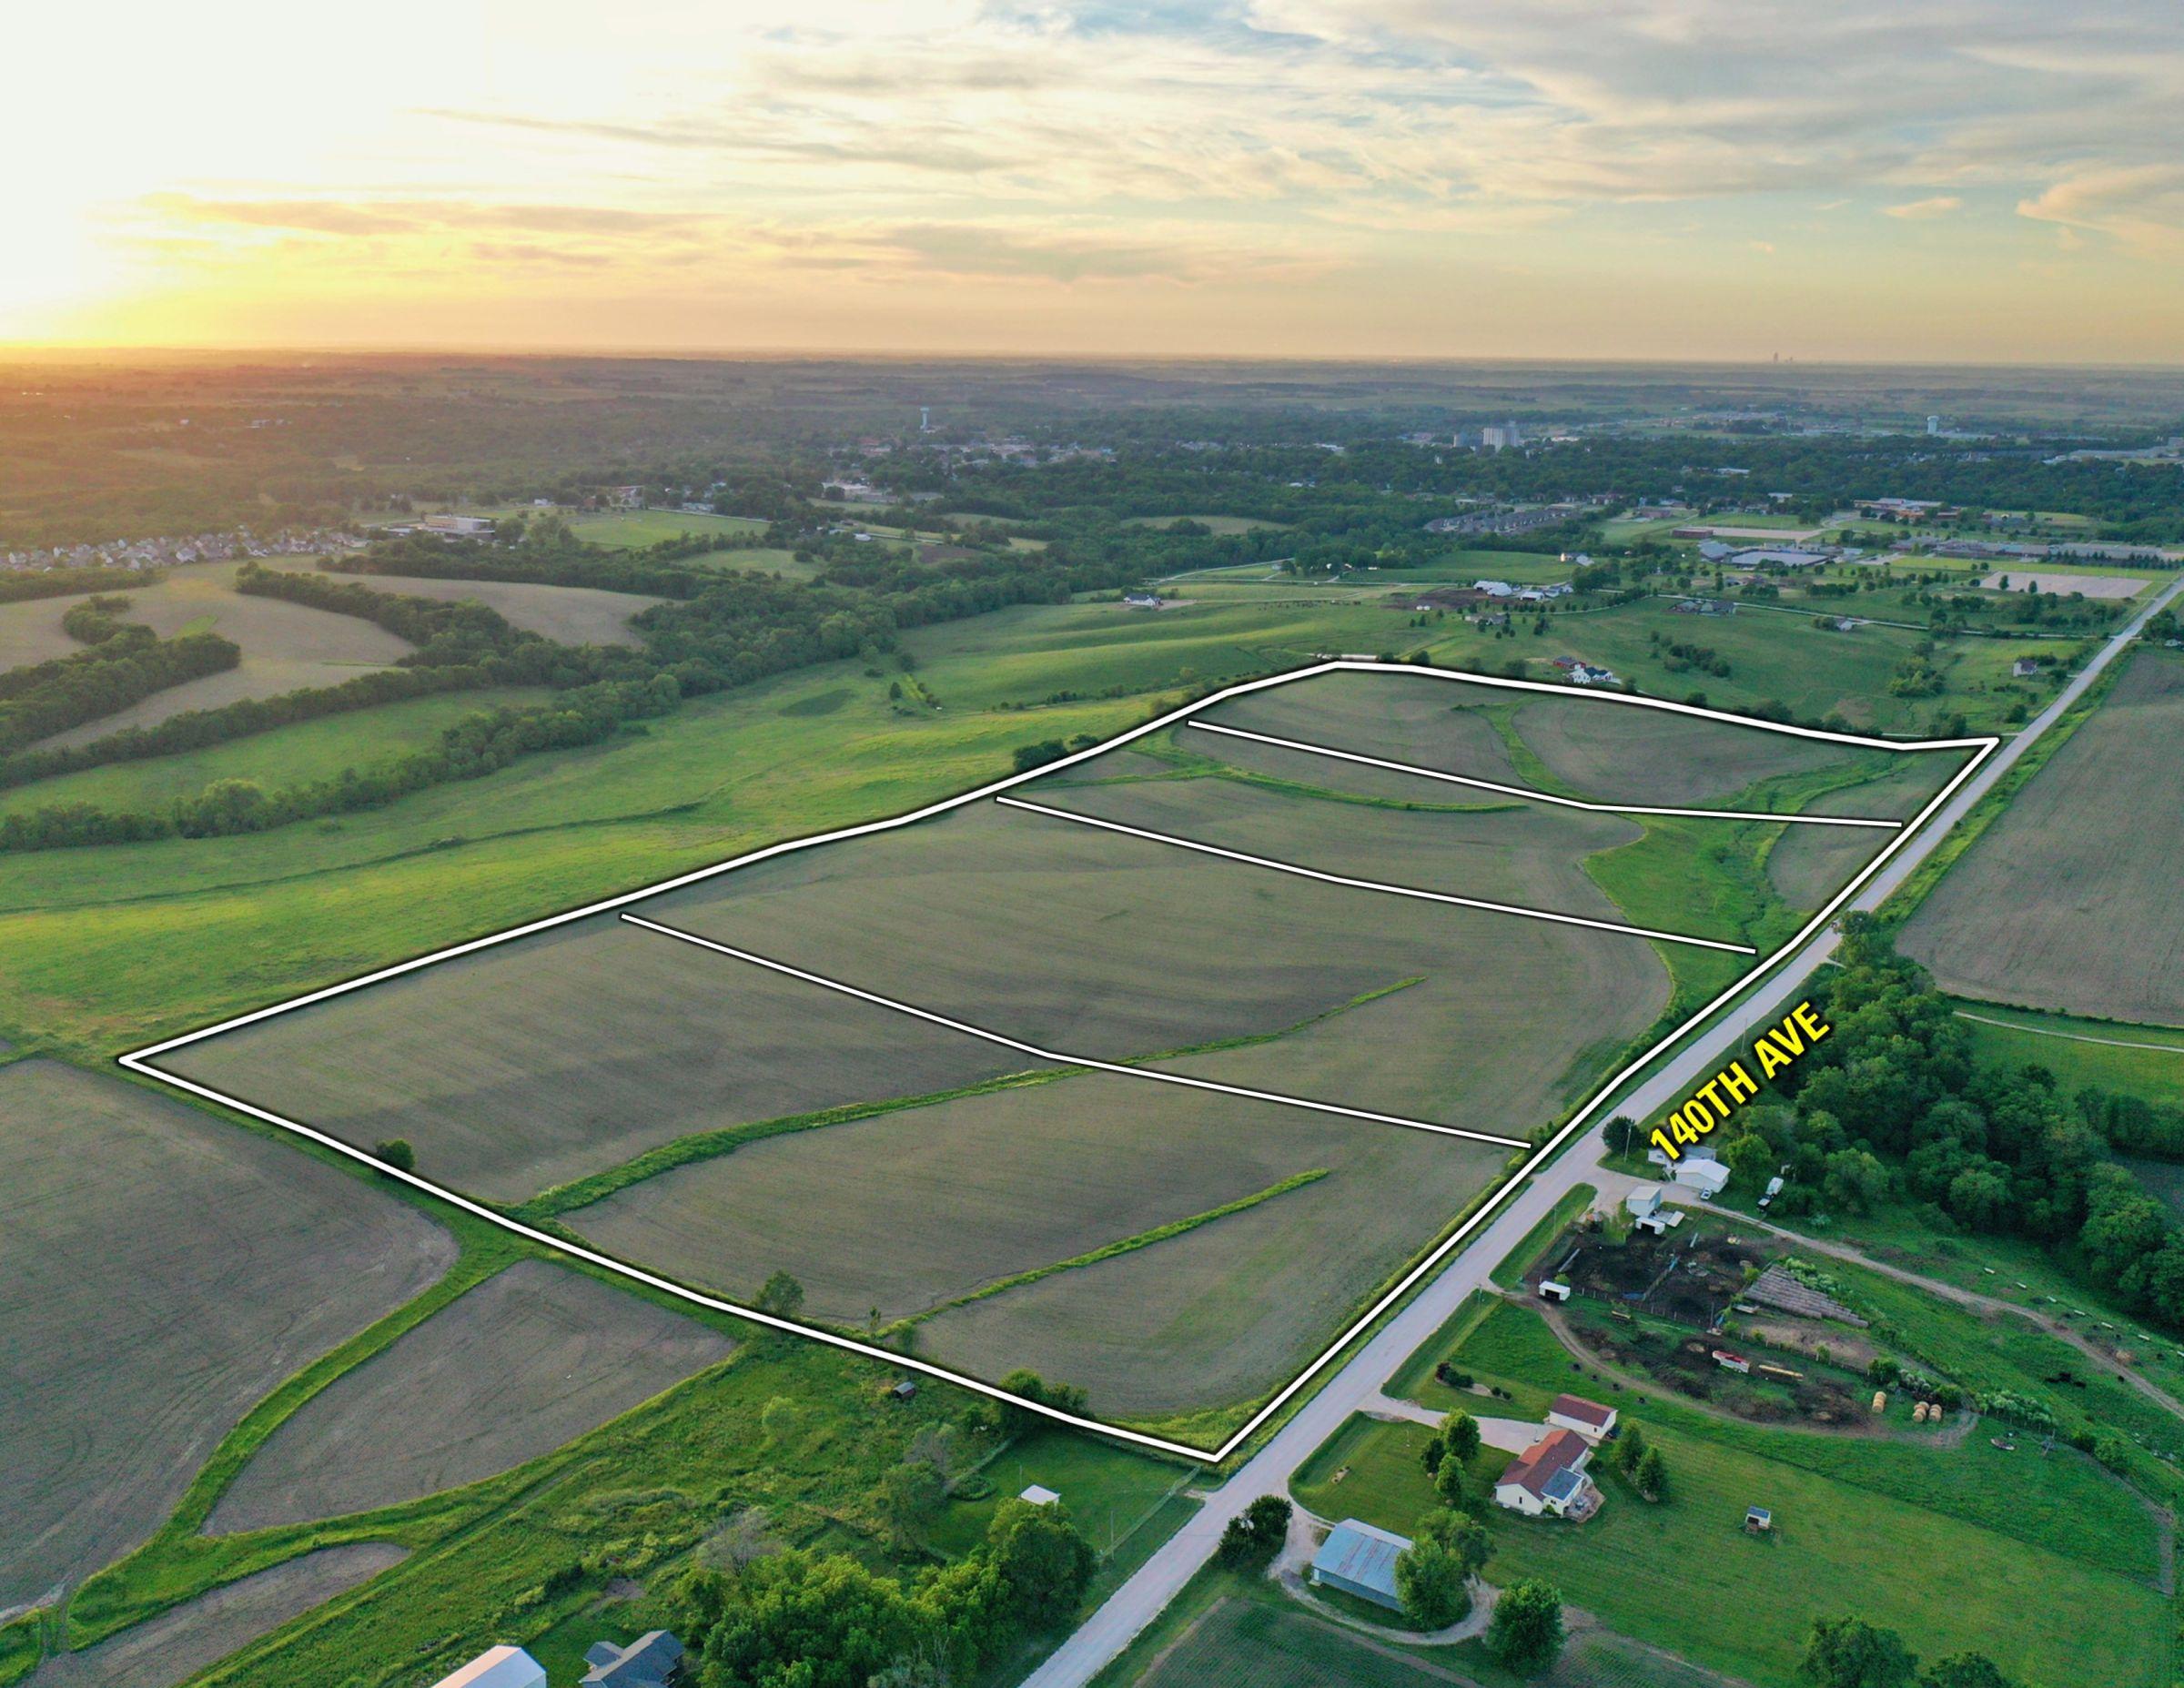 development-land-warren-county-iowa-20-acres-listing-number-15423-3-2021-03-26-184717.jpg